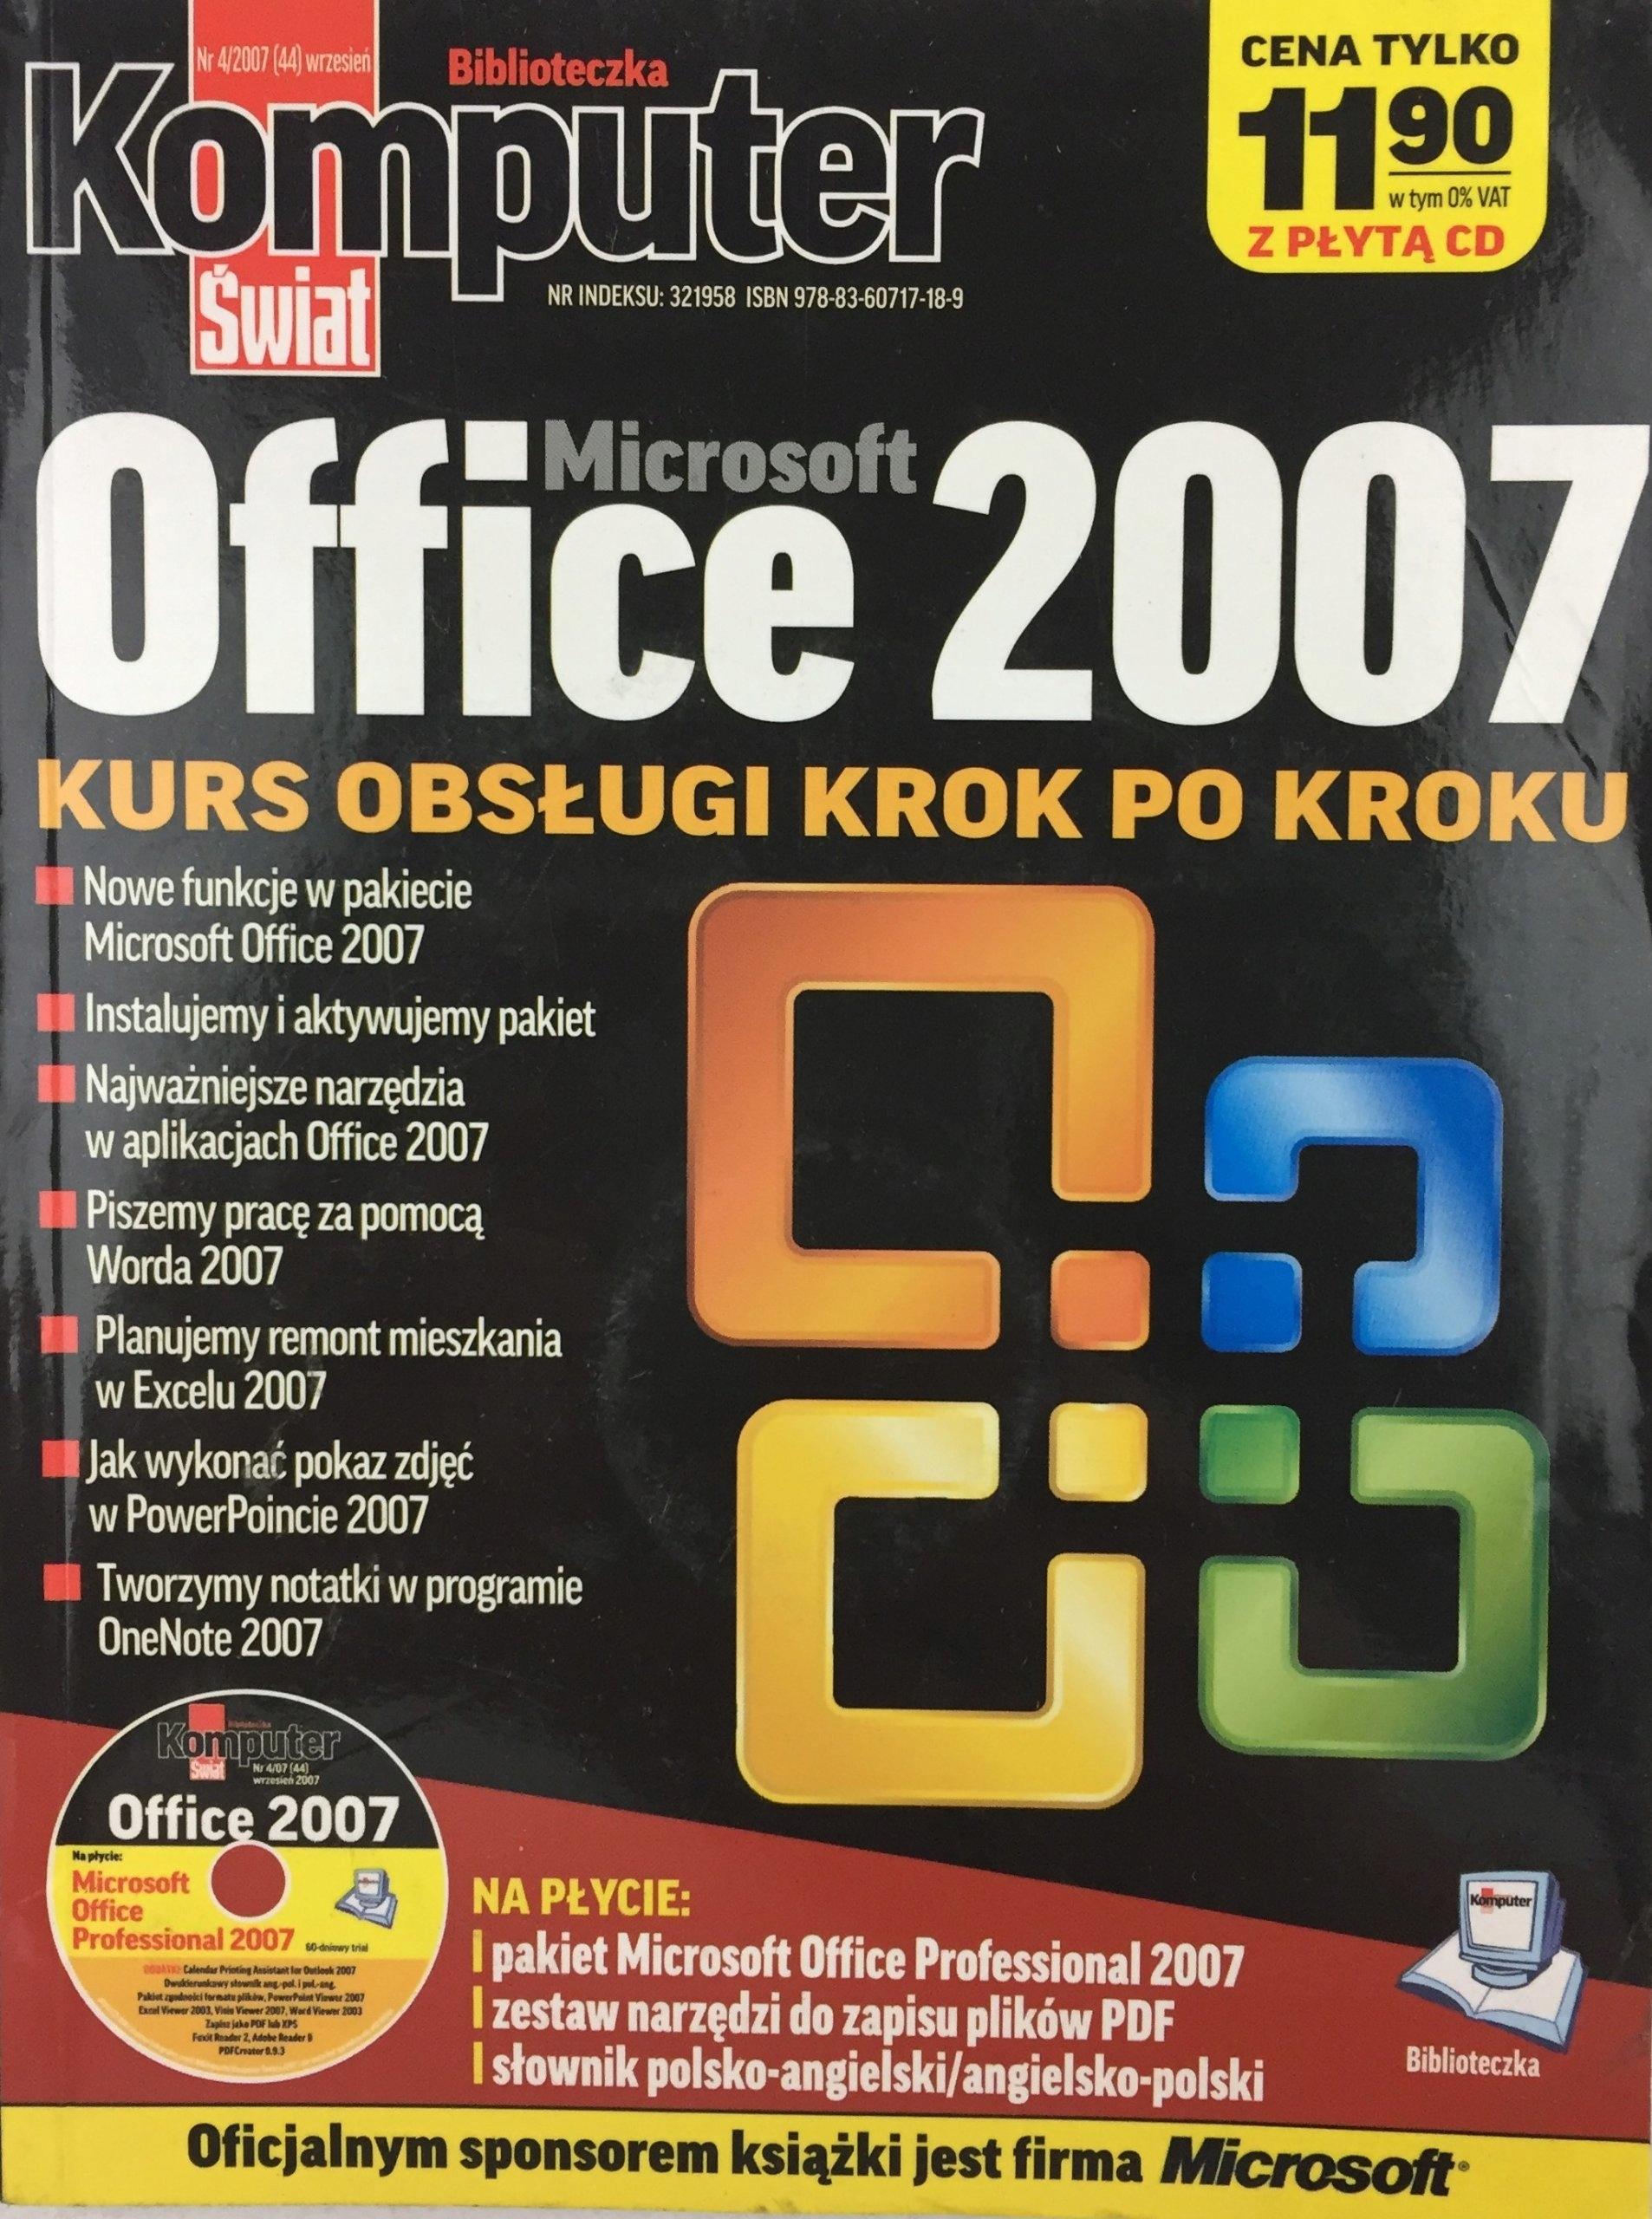 Microsoft Office 2007 kurs Komputer Świat z CD NEW